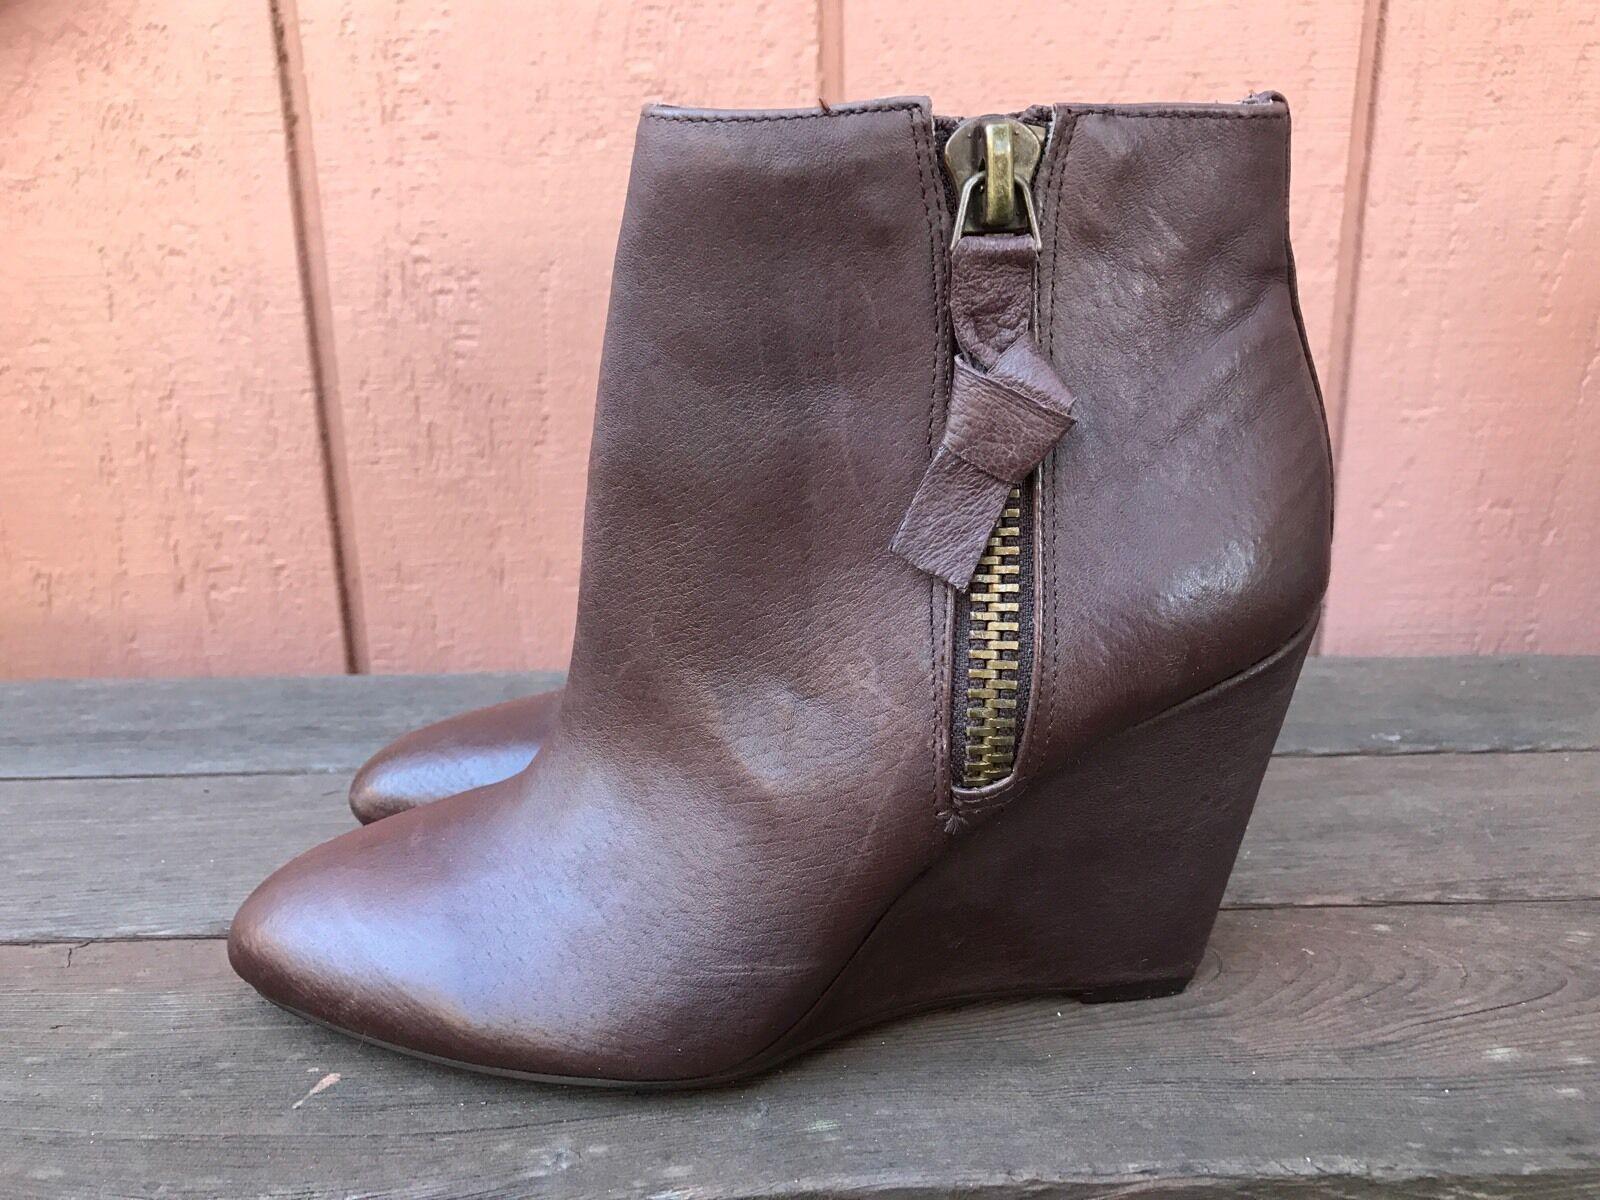 EUC Steve Madden Zellda Wedge Brown Leather US 6.5 M